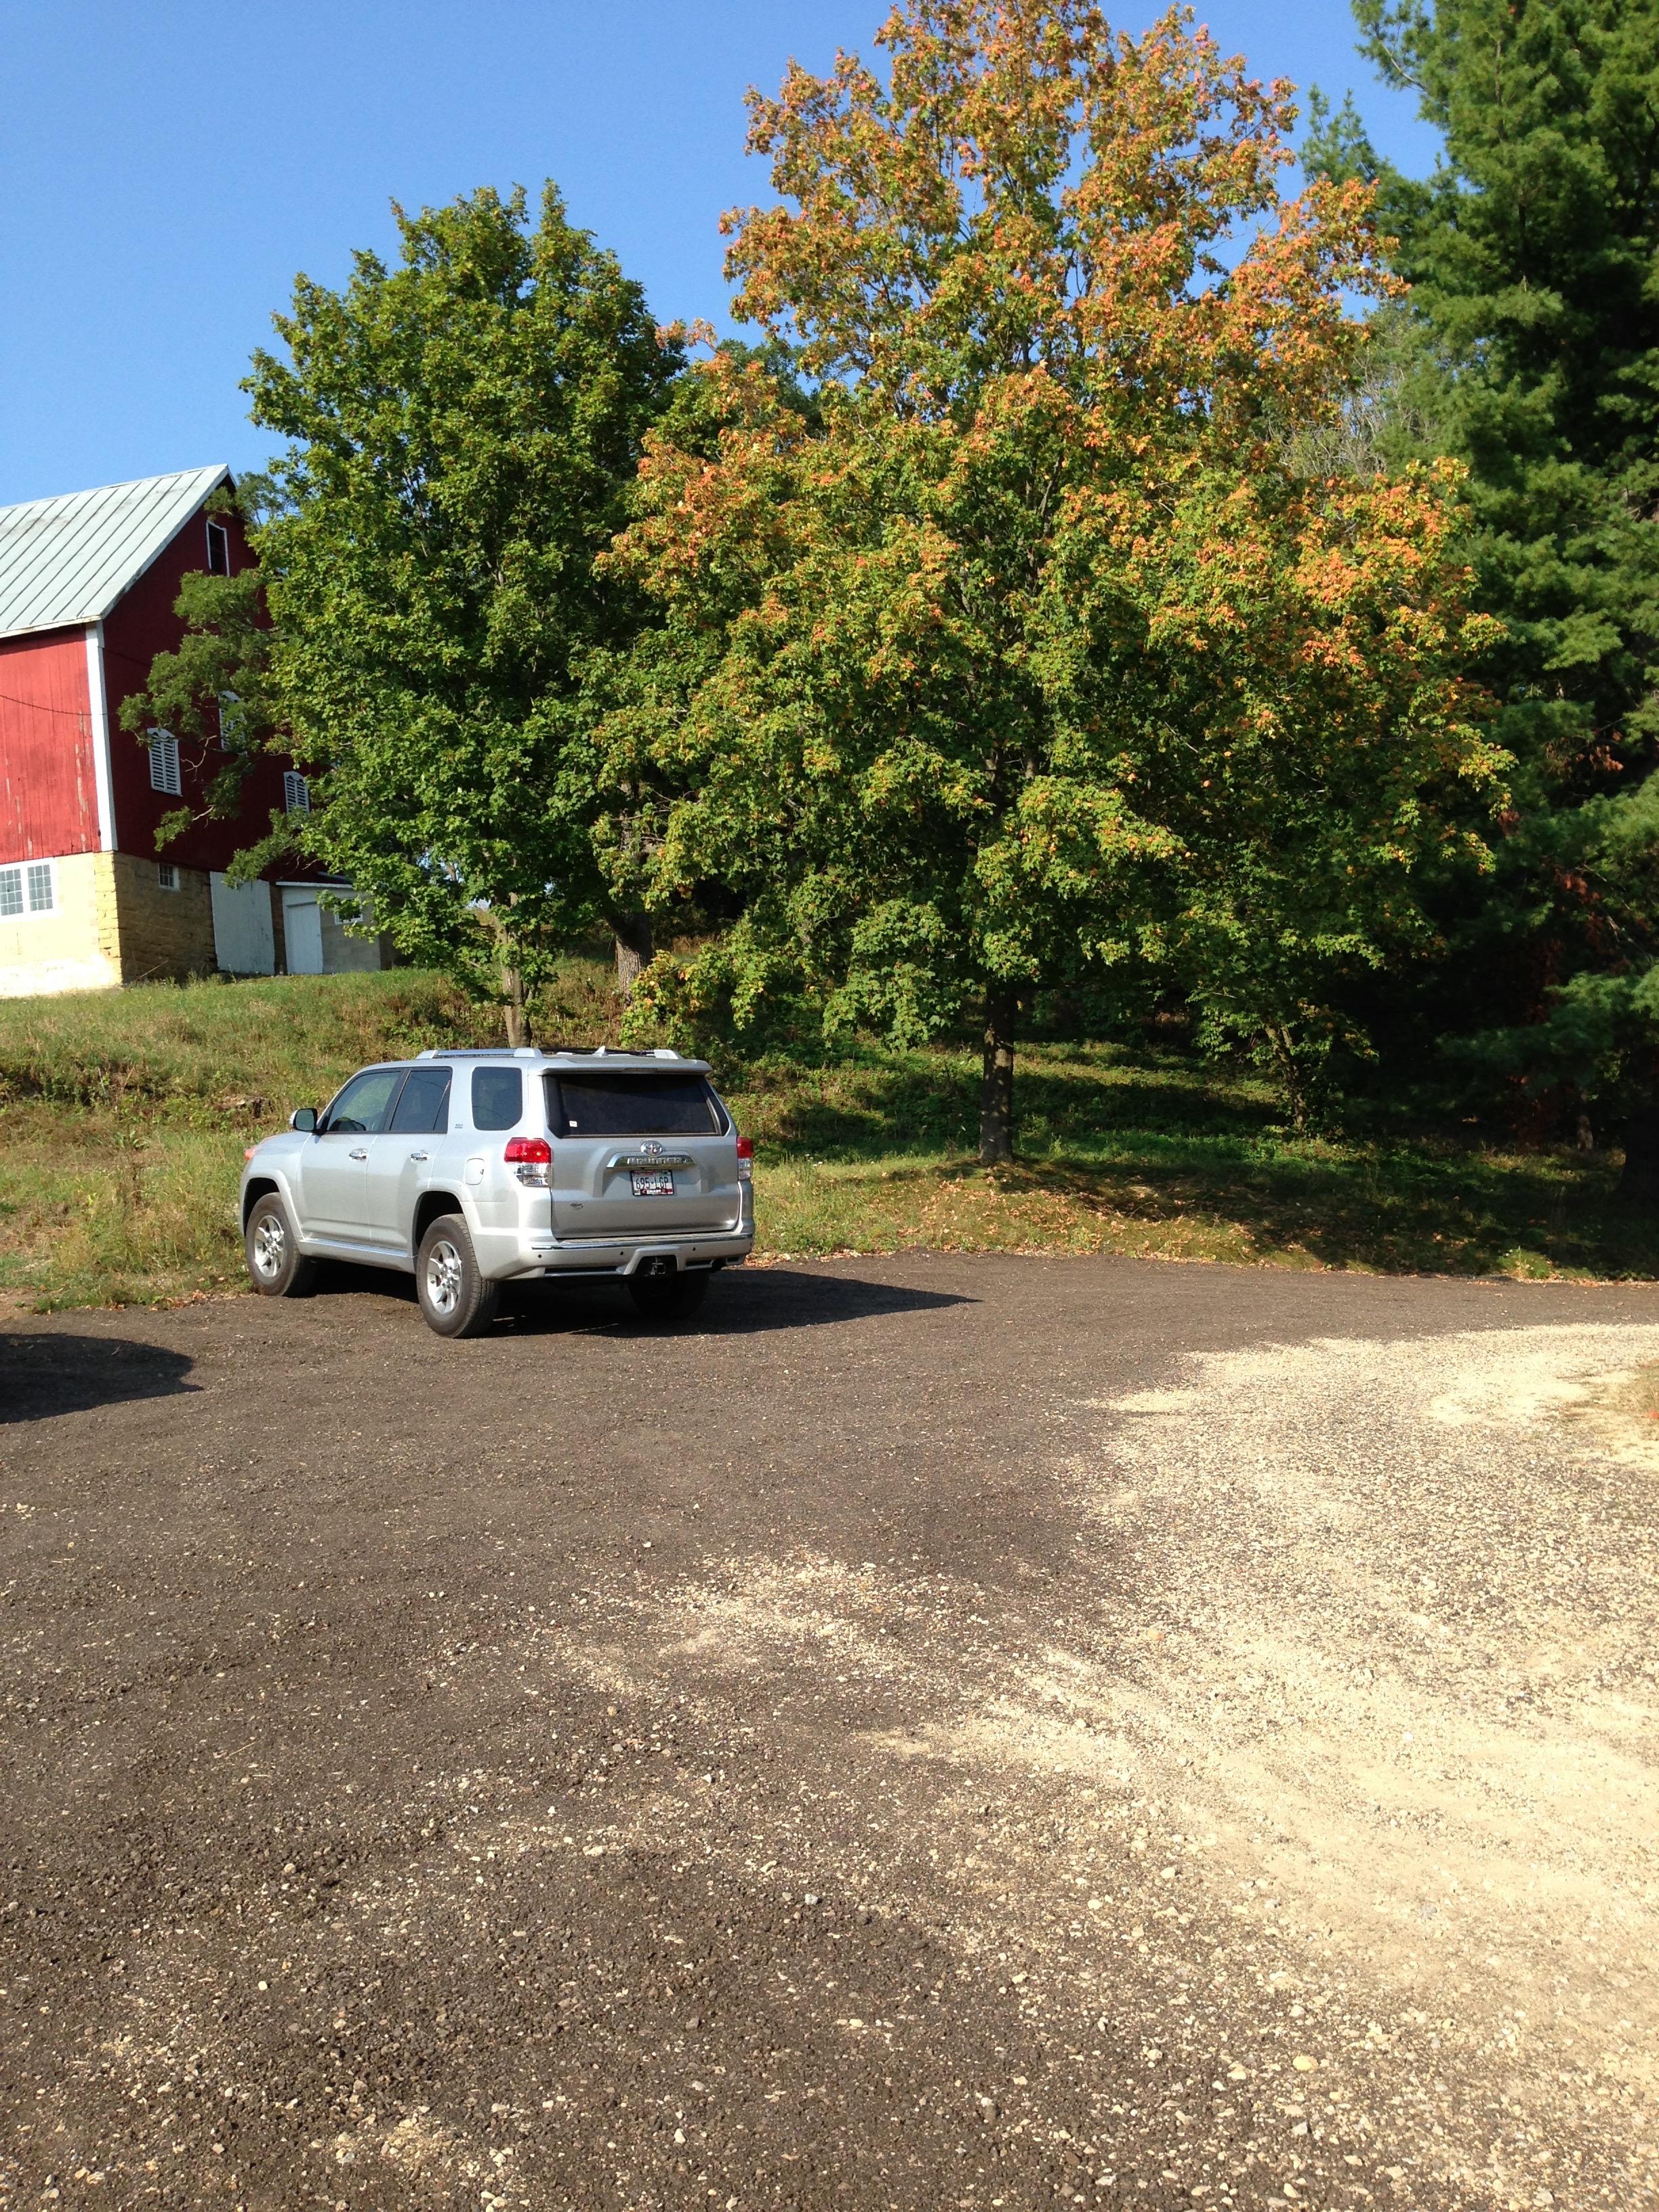 Student parking lot